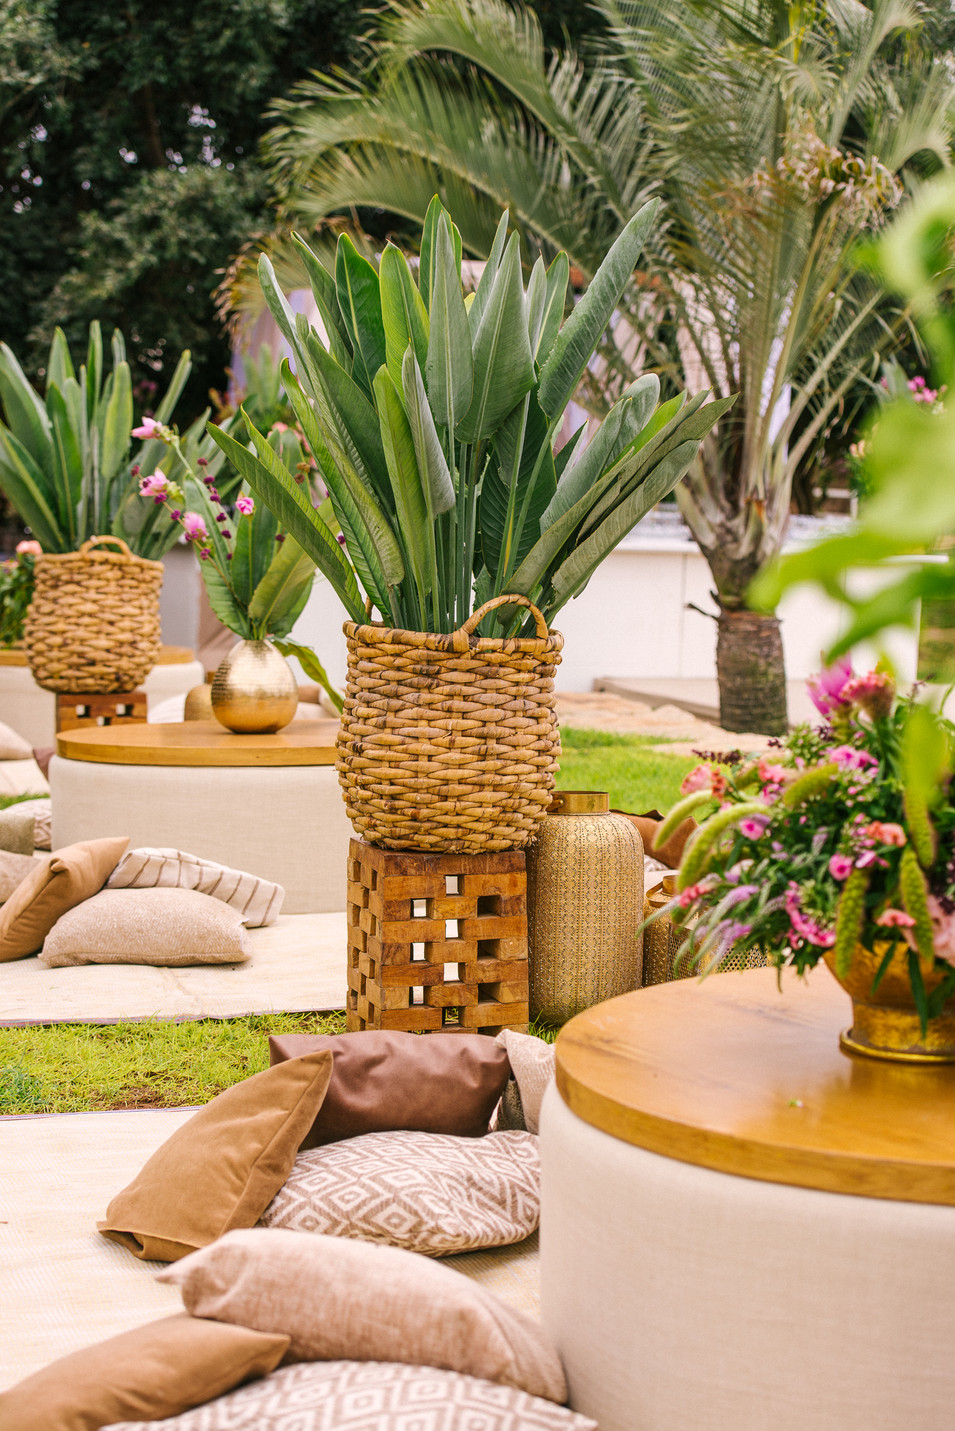 House of Green | Yahav Green | Yulia Tokarev | Private ranch